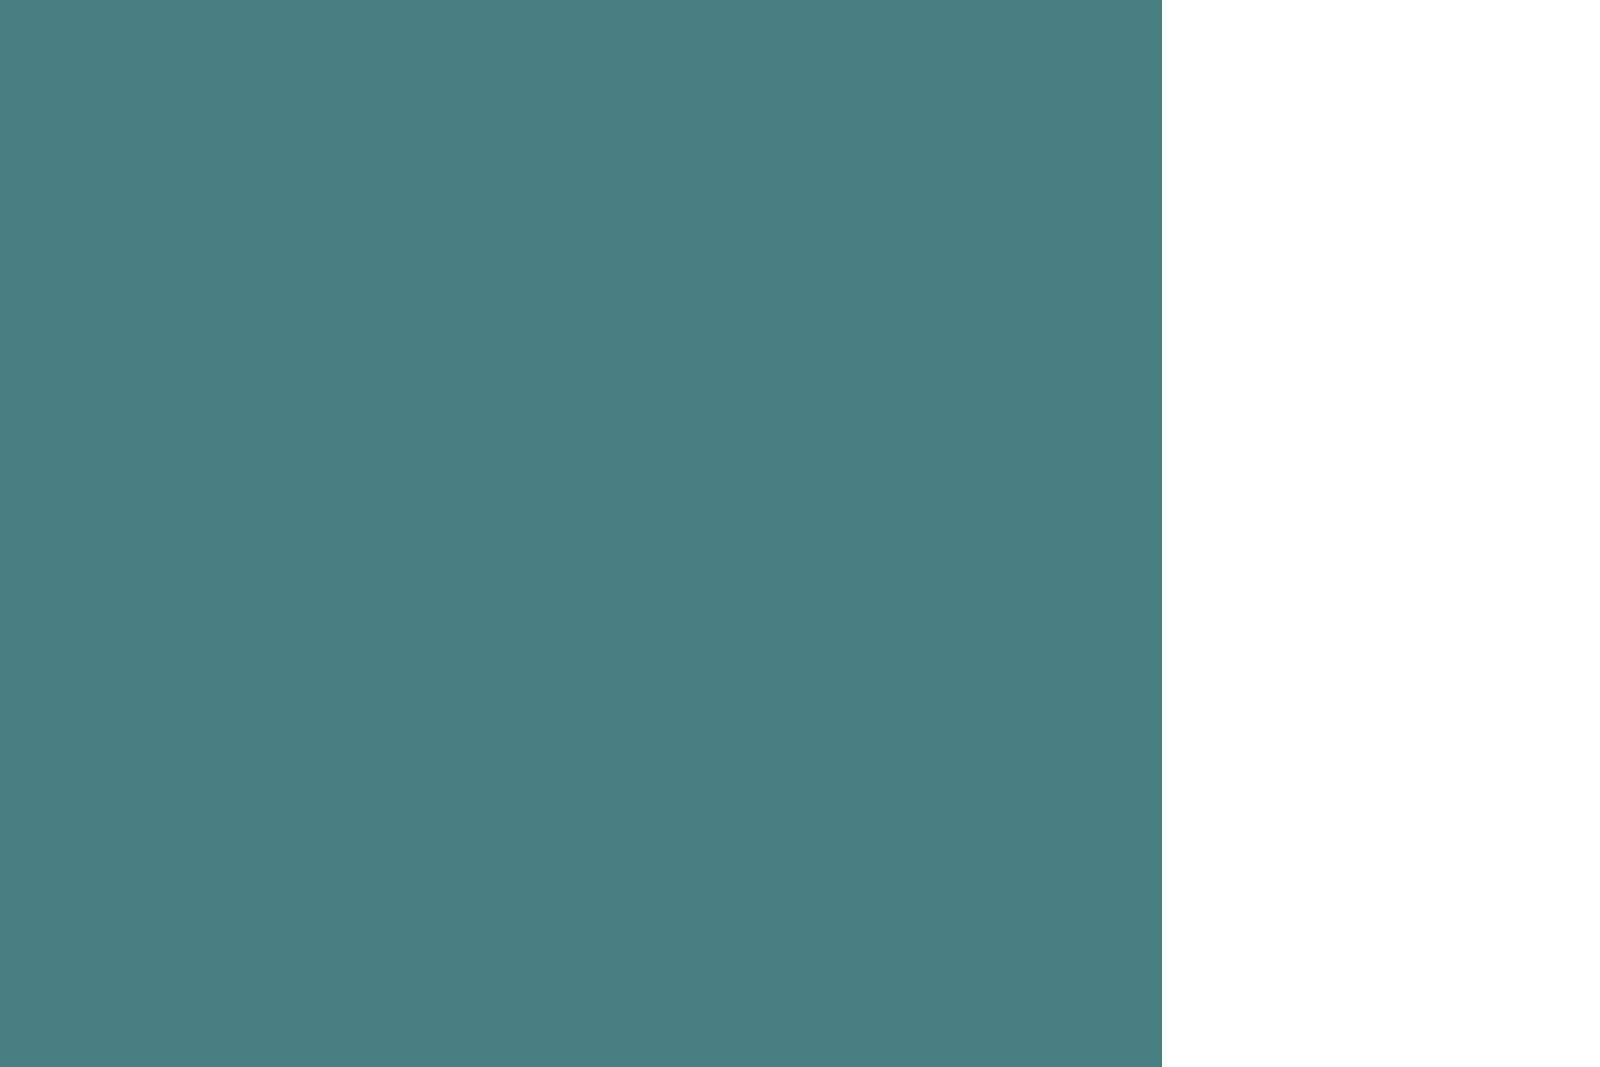 LS-color-teal